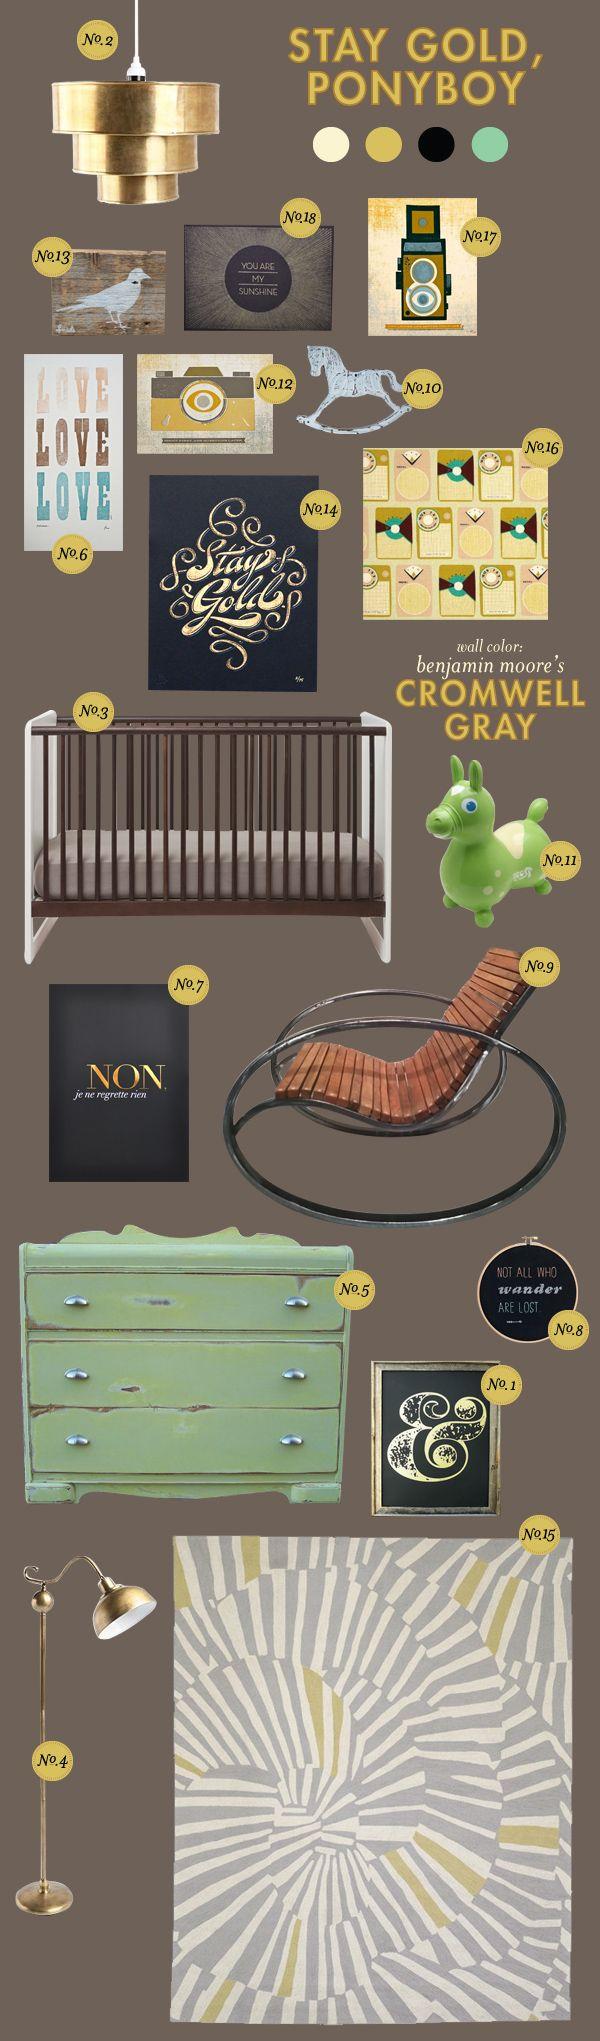 stay gold, ponyboy - nursery design by laybabylay....love this!